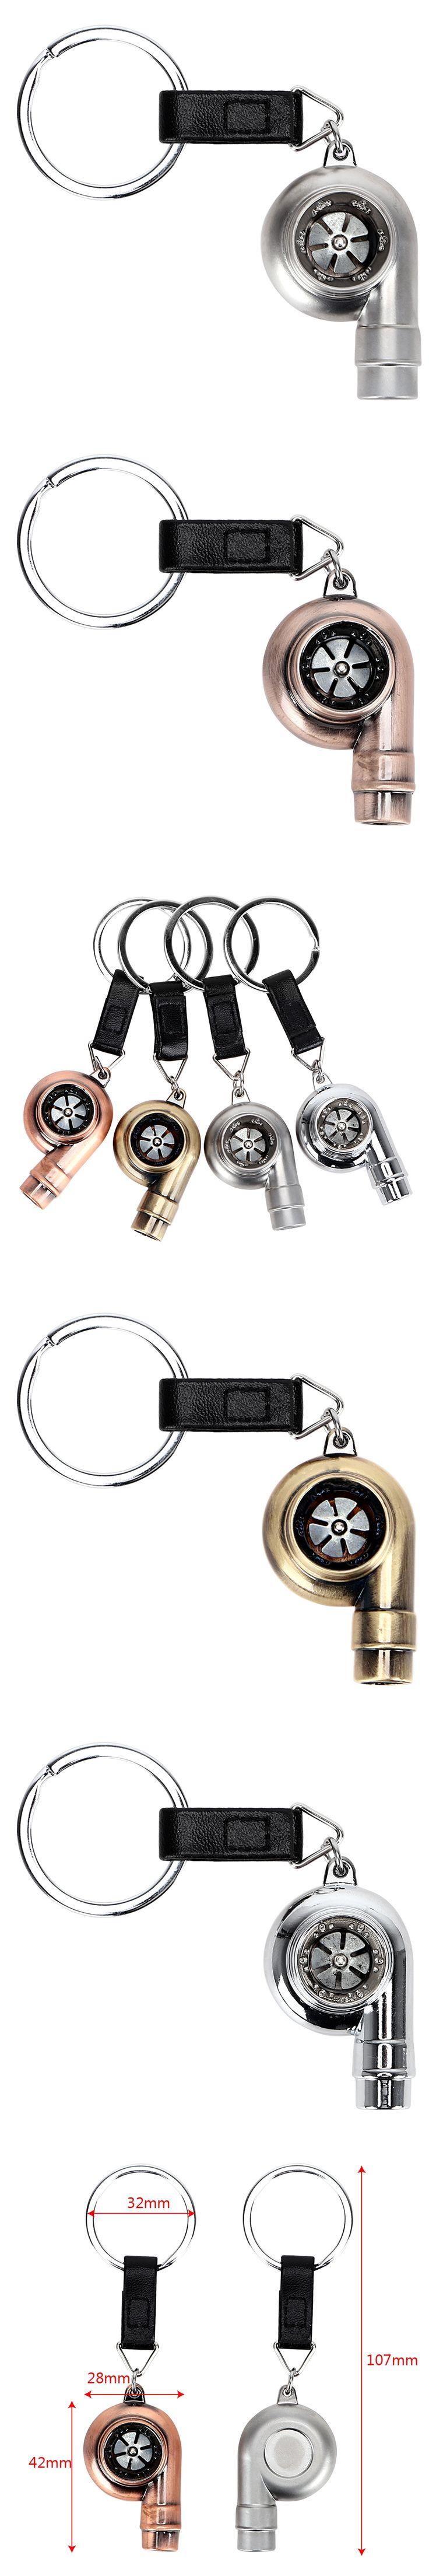 4 Colors Turbo Keychains Auto Key Ring Vintage Car Decoration Key Chain Accessories for kia rio nissan chevrolet cruze subaru vw